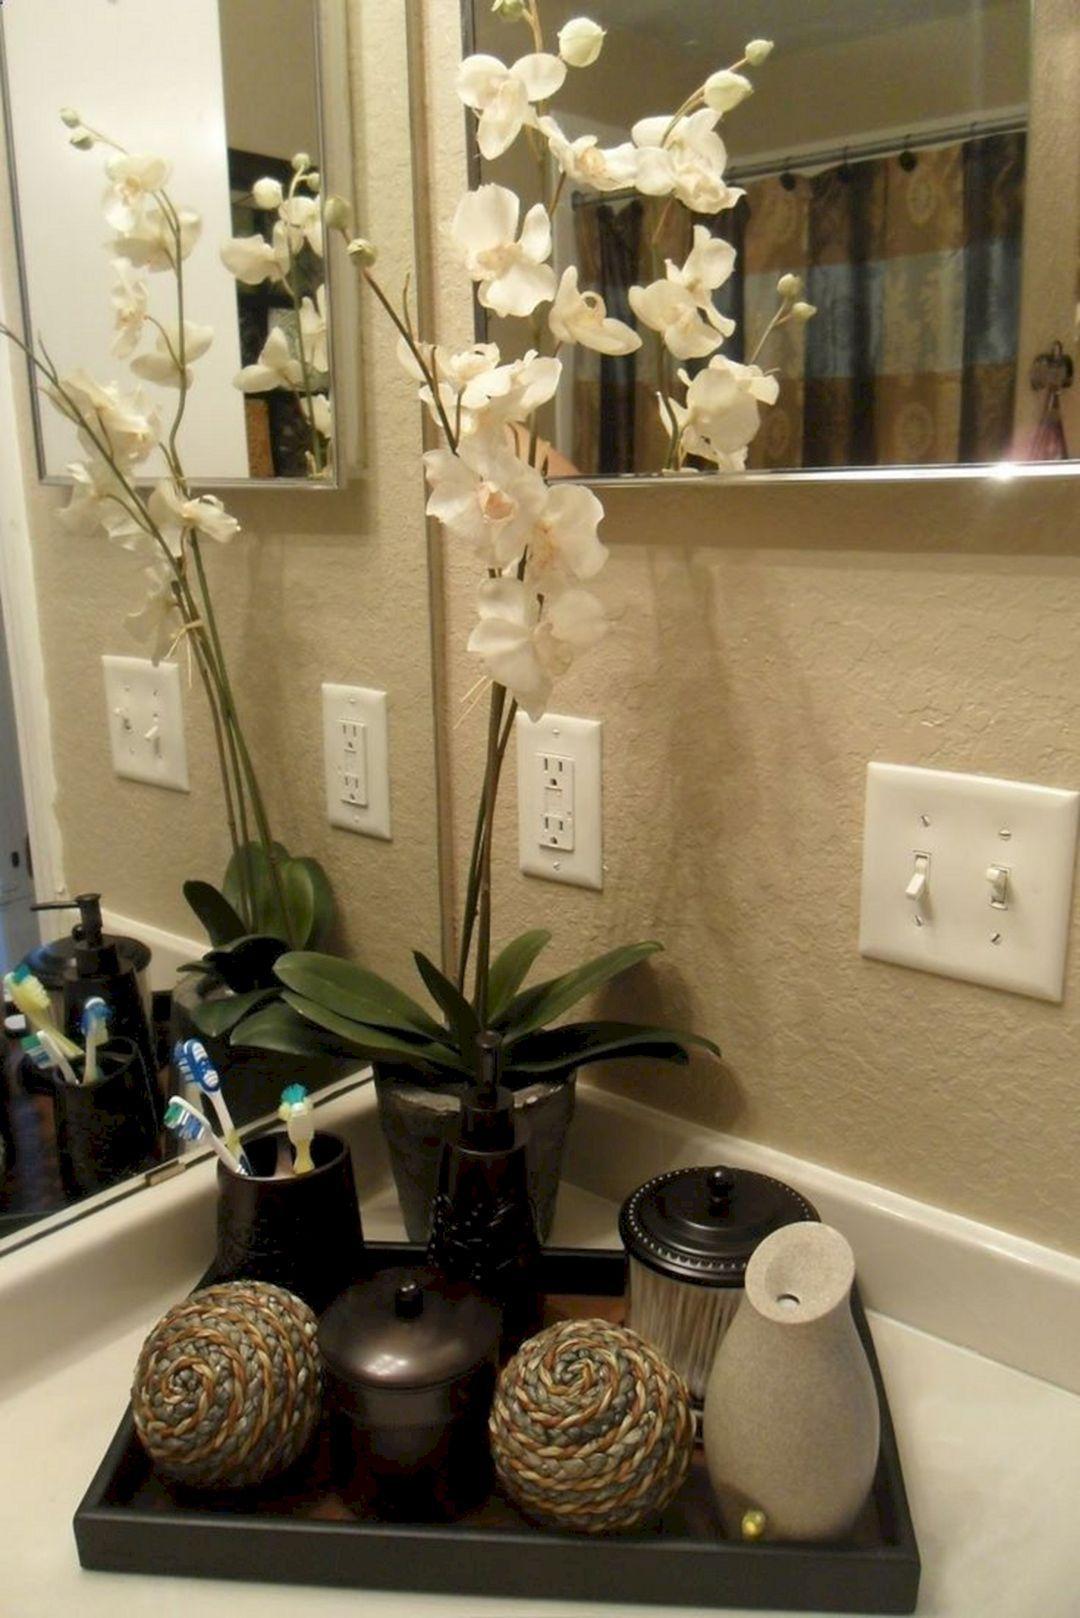 Inspiring 20 Amazing Spa Room Decorating Ideas For Your Fun Body Care Freshouz